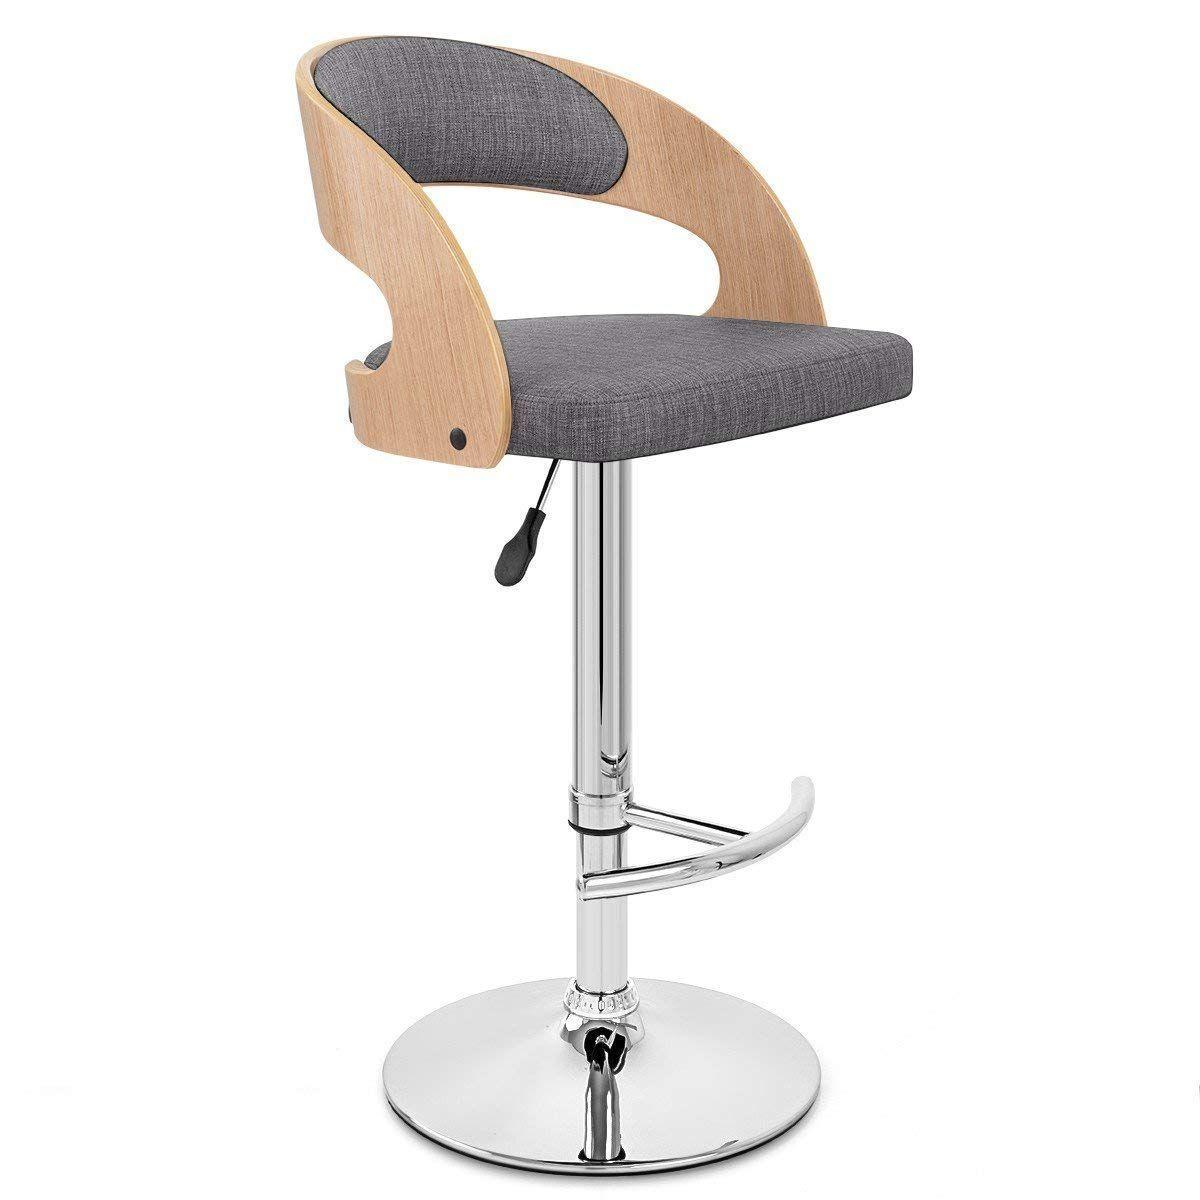 Chuan Han Bar Stool Bar Chair Adjustable Rotating Gas Lift, Chrome